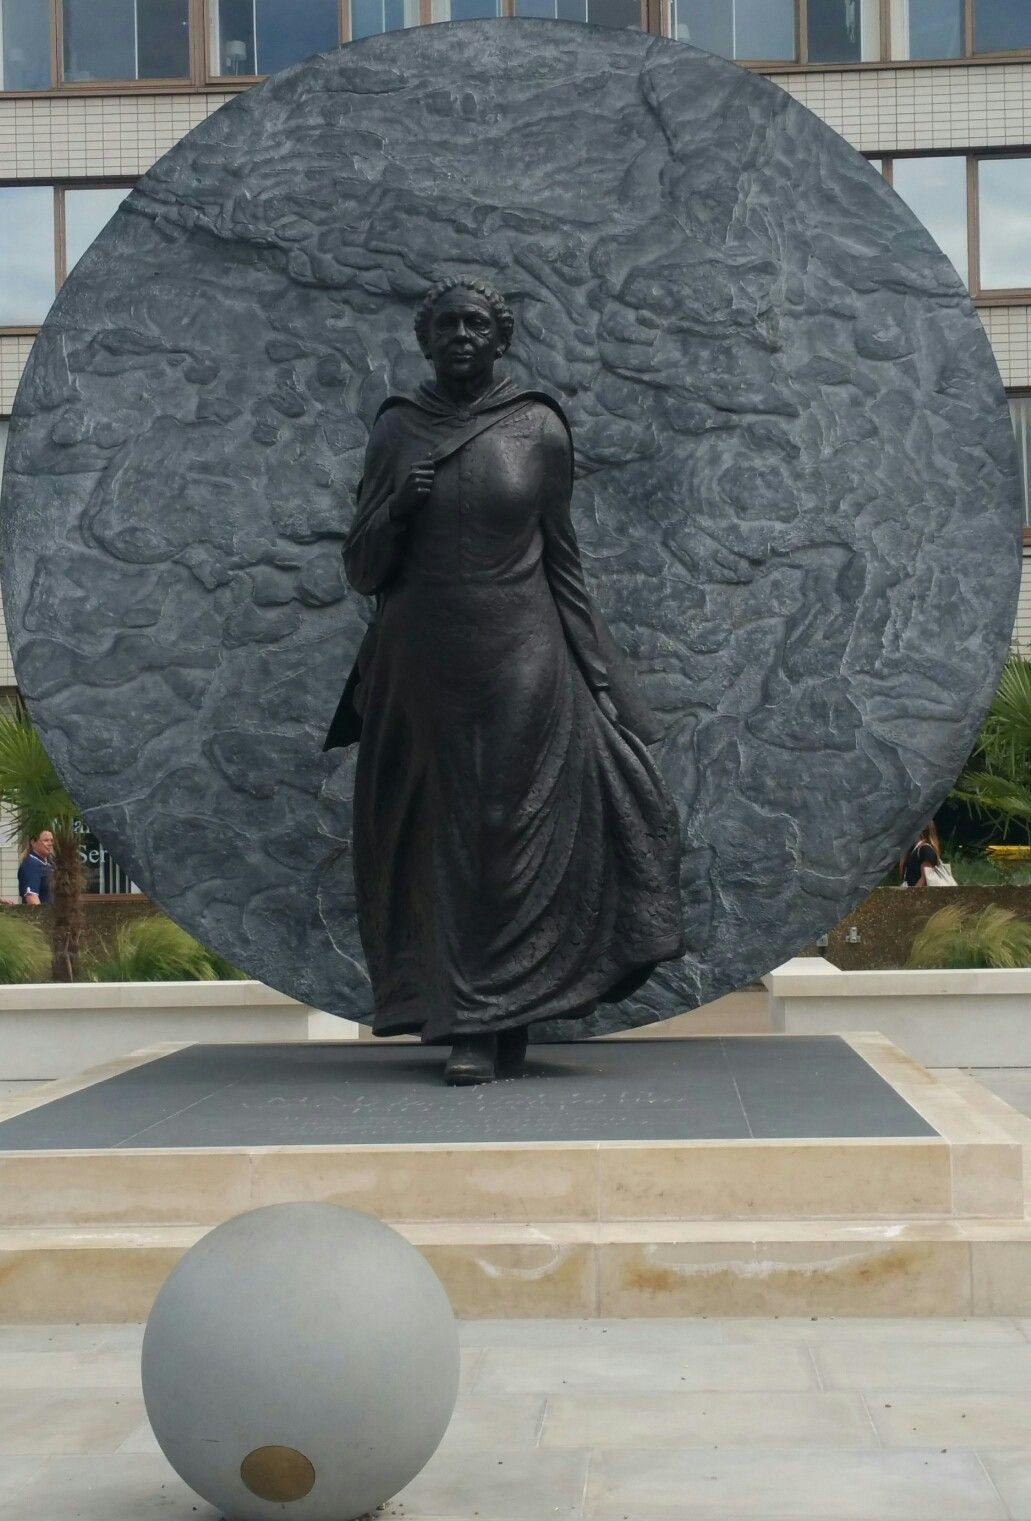 Statute of Mary SEACOLE St. Thomas' hospital Buddha